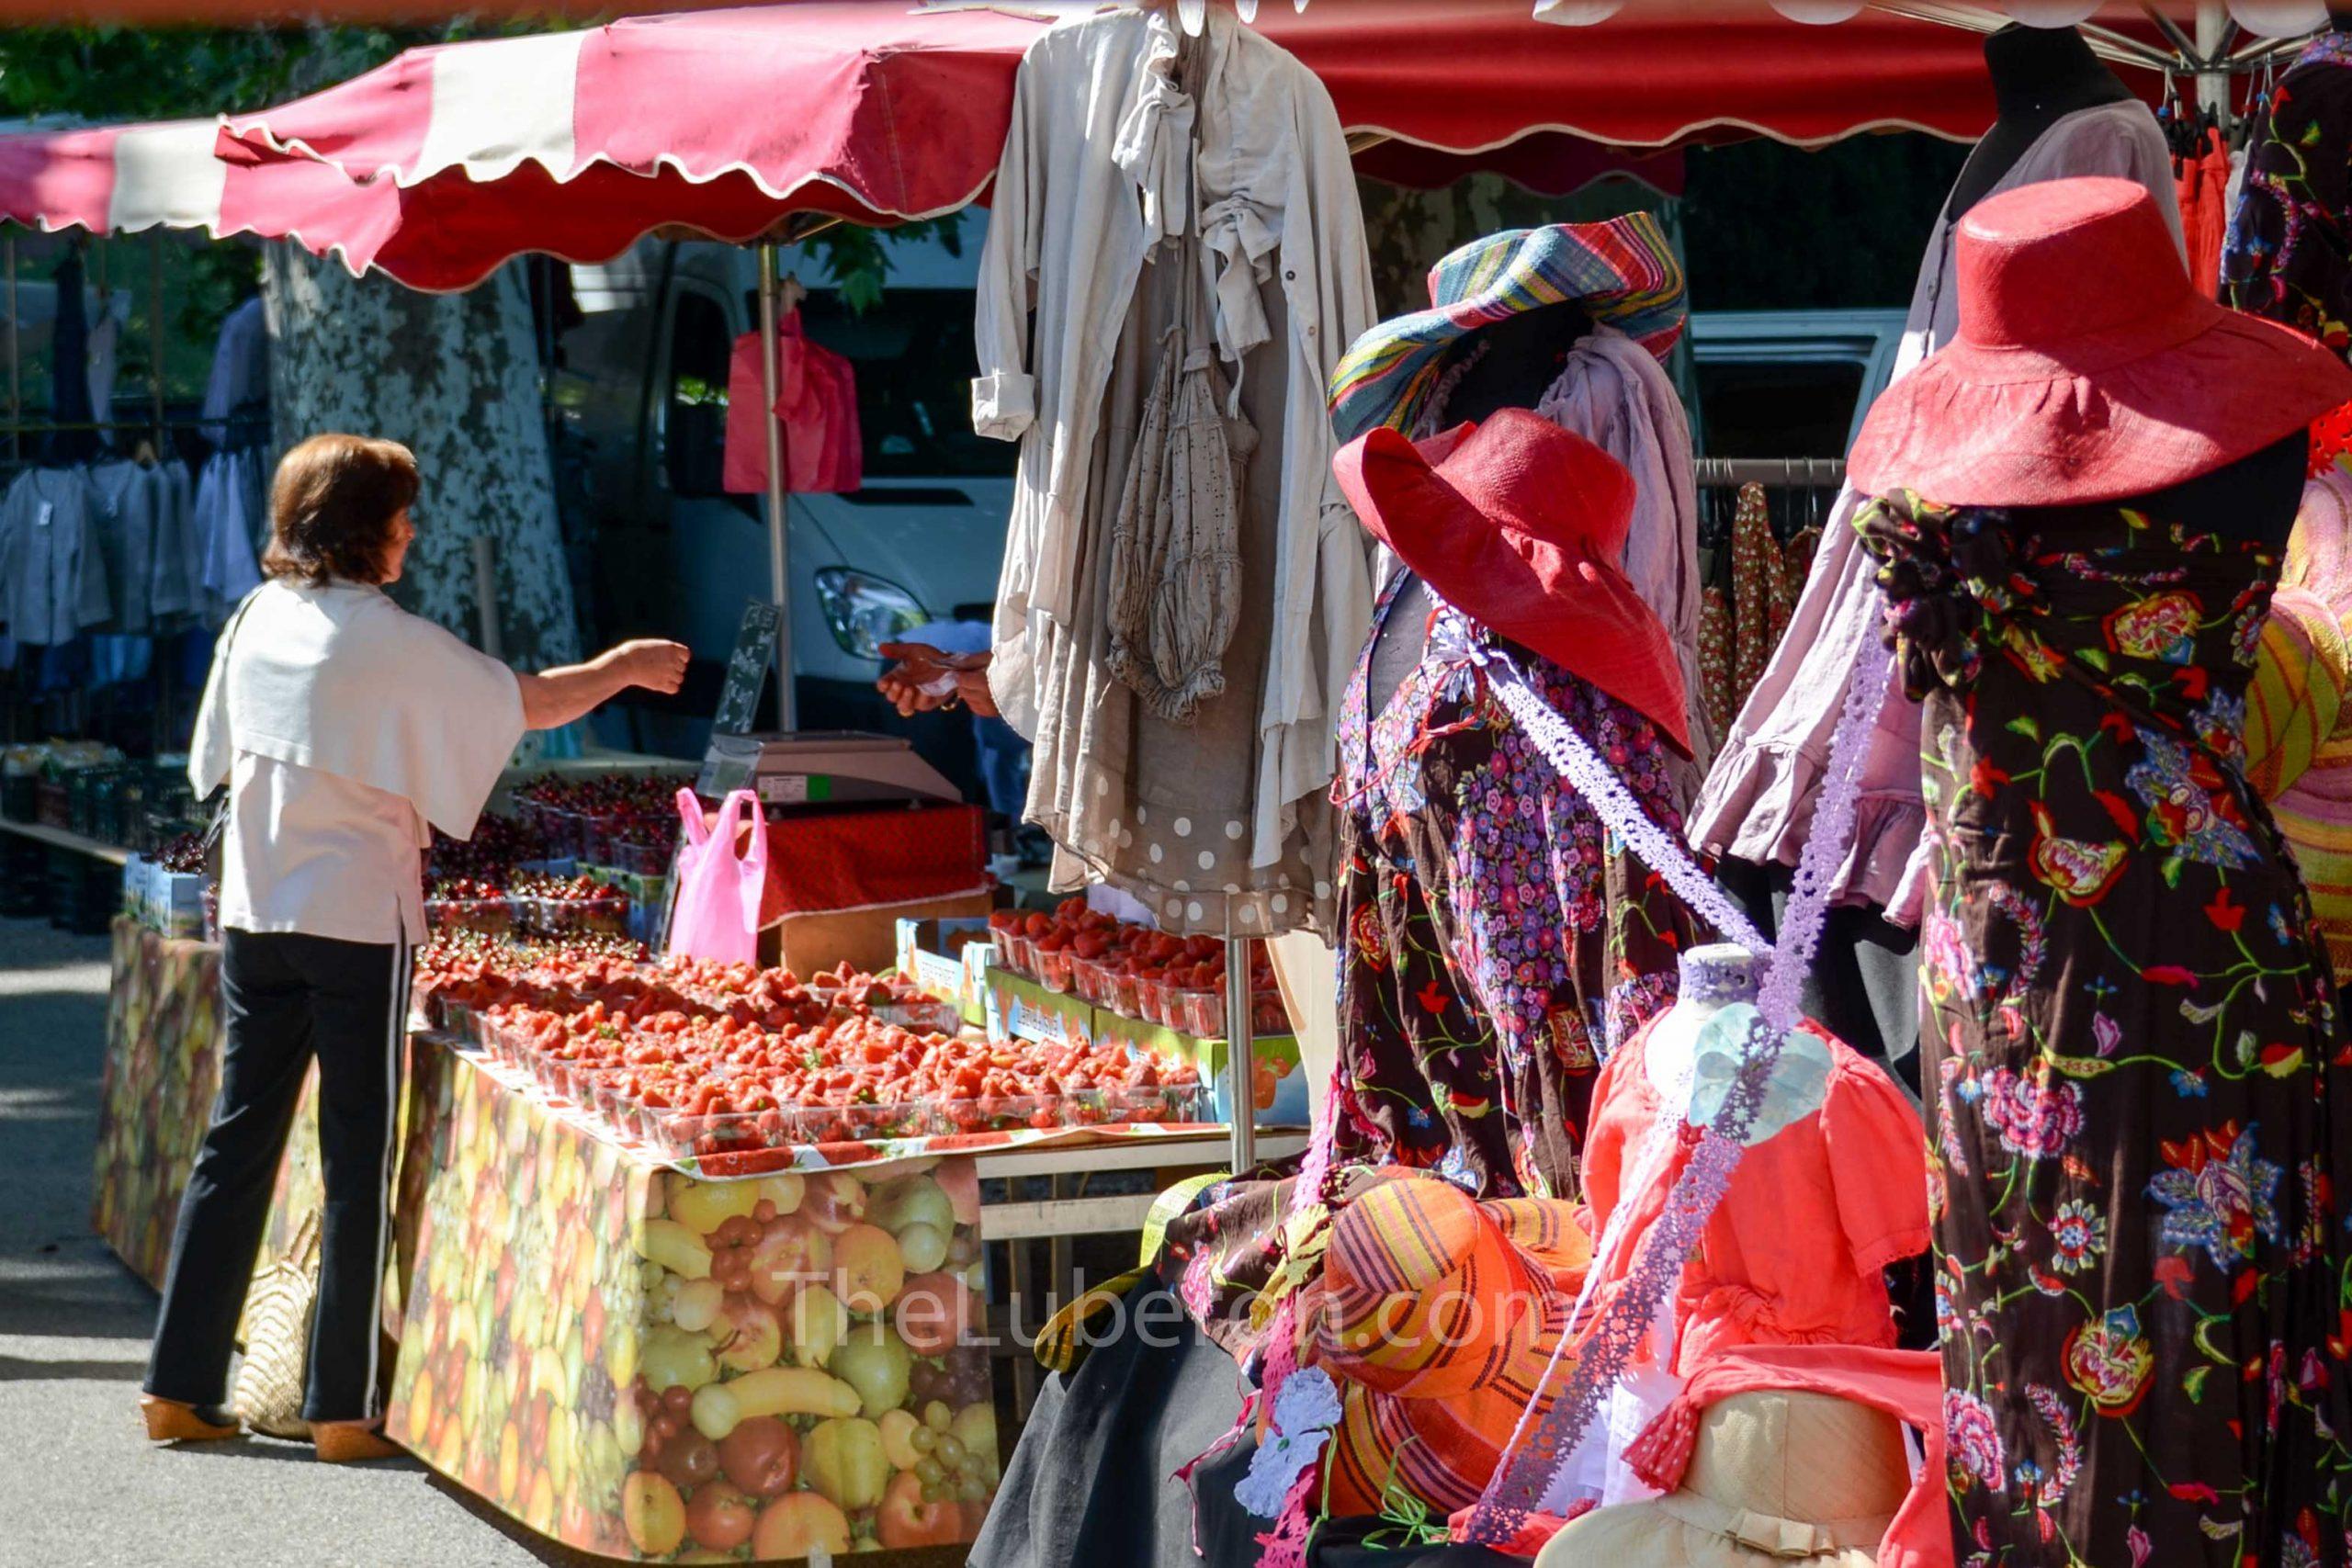 Strawberry seller at Lourmarin market